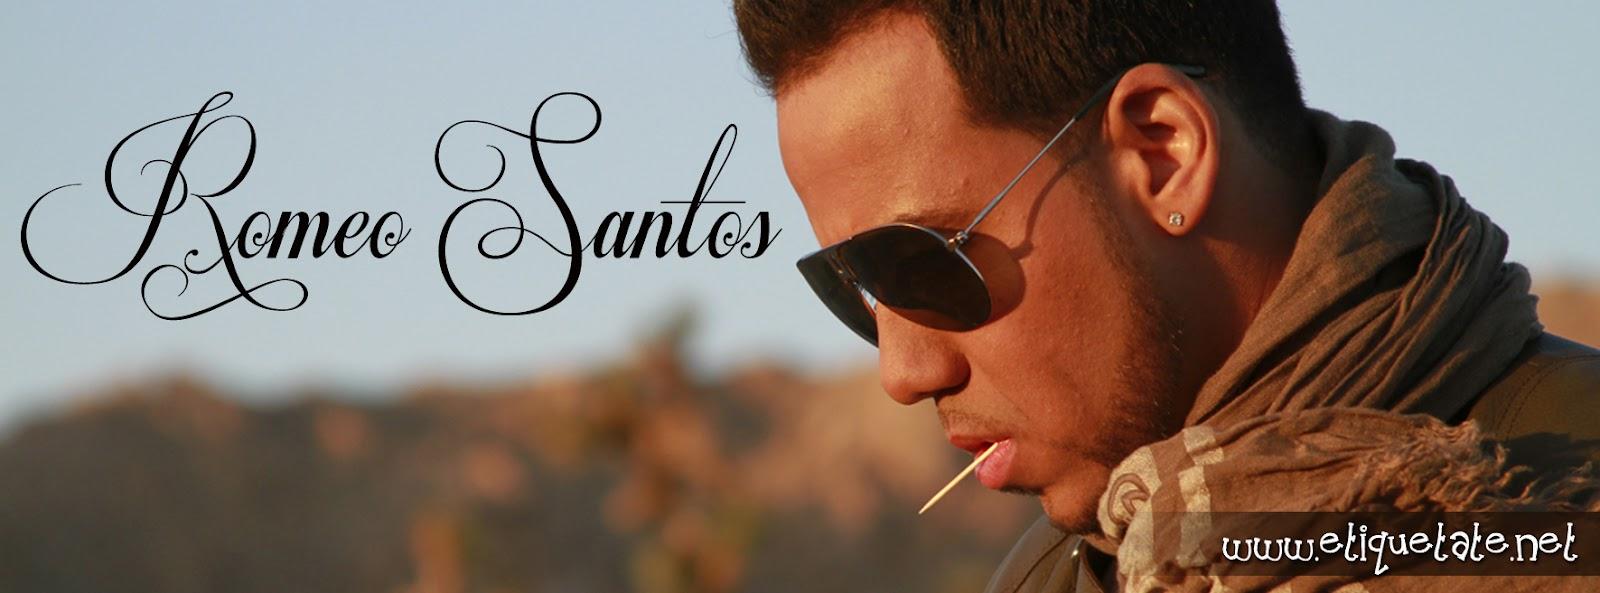 Romeo Santos - Cancioncitas de Amor - YouTube